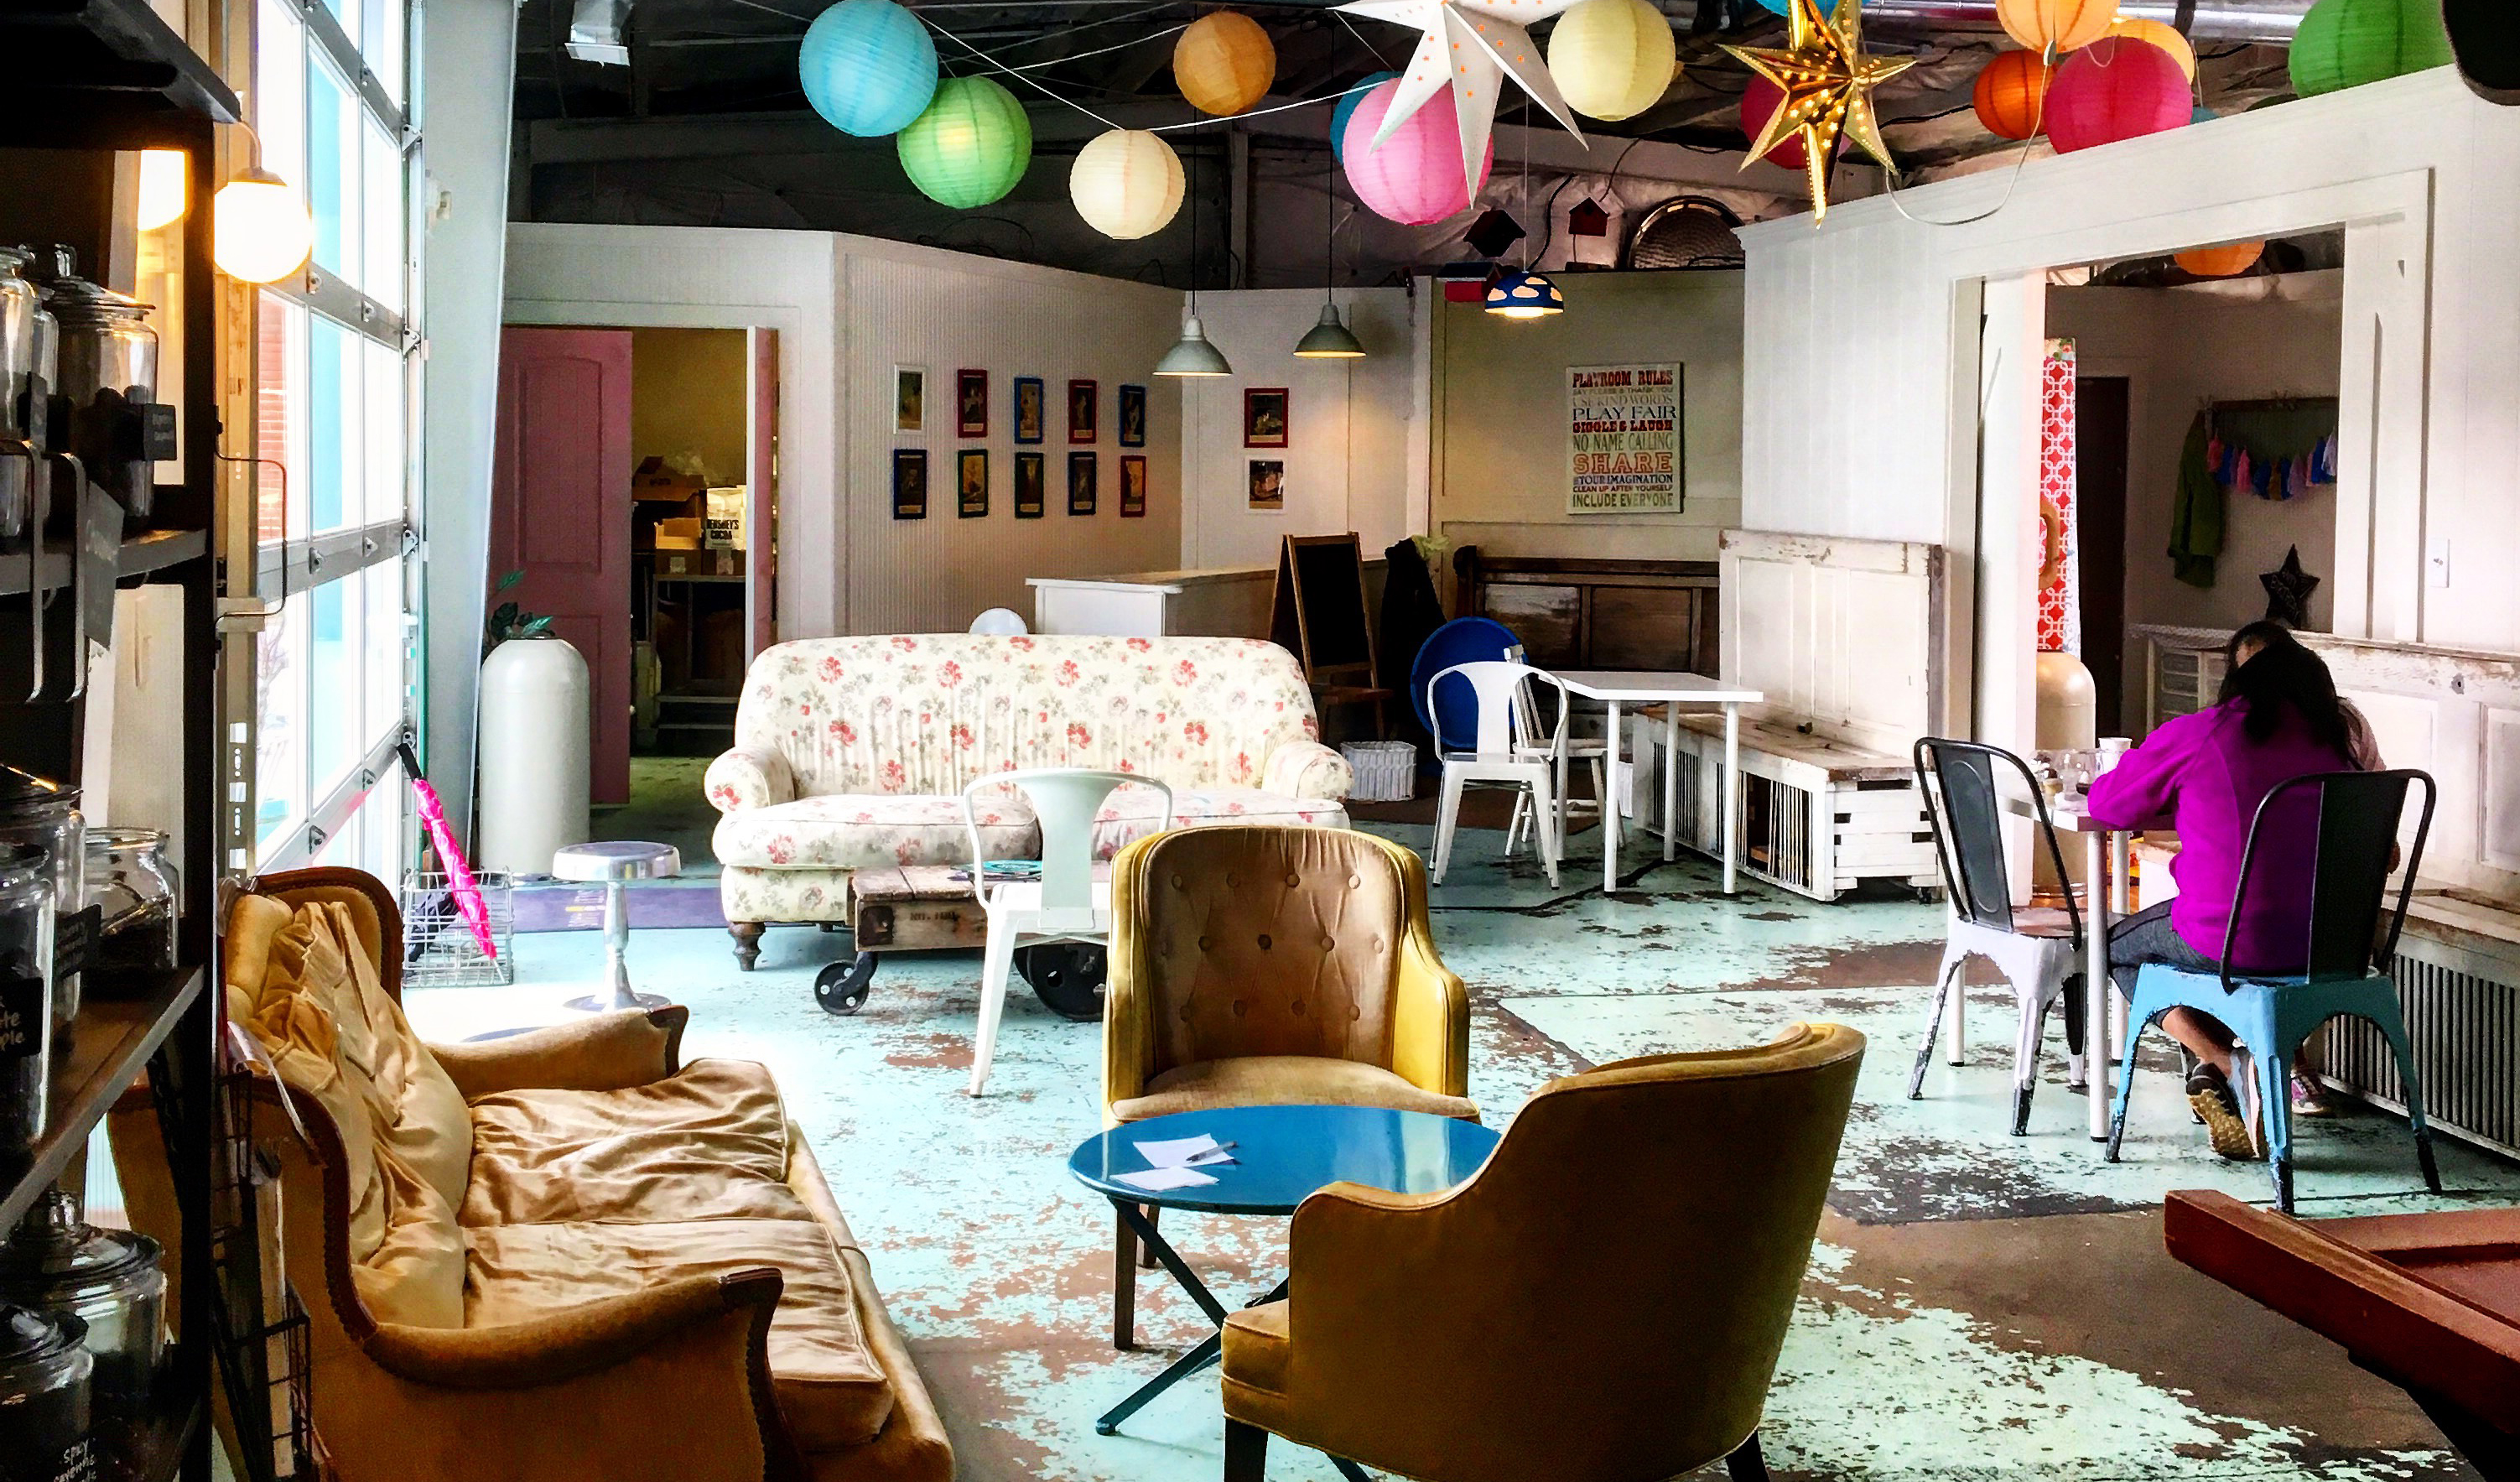 Sweet Haus café